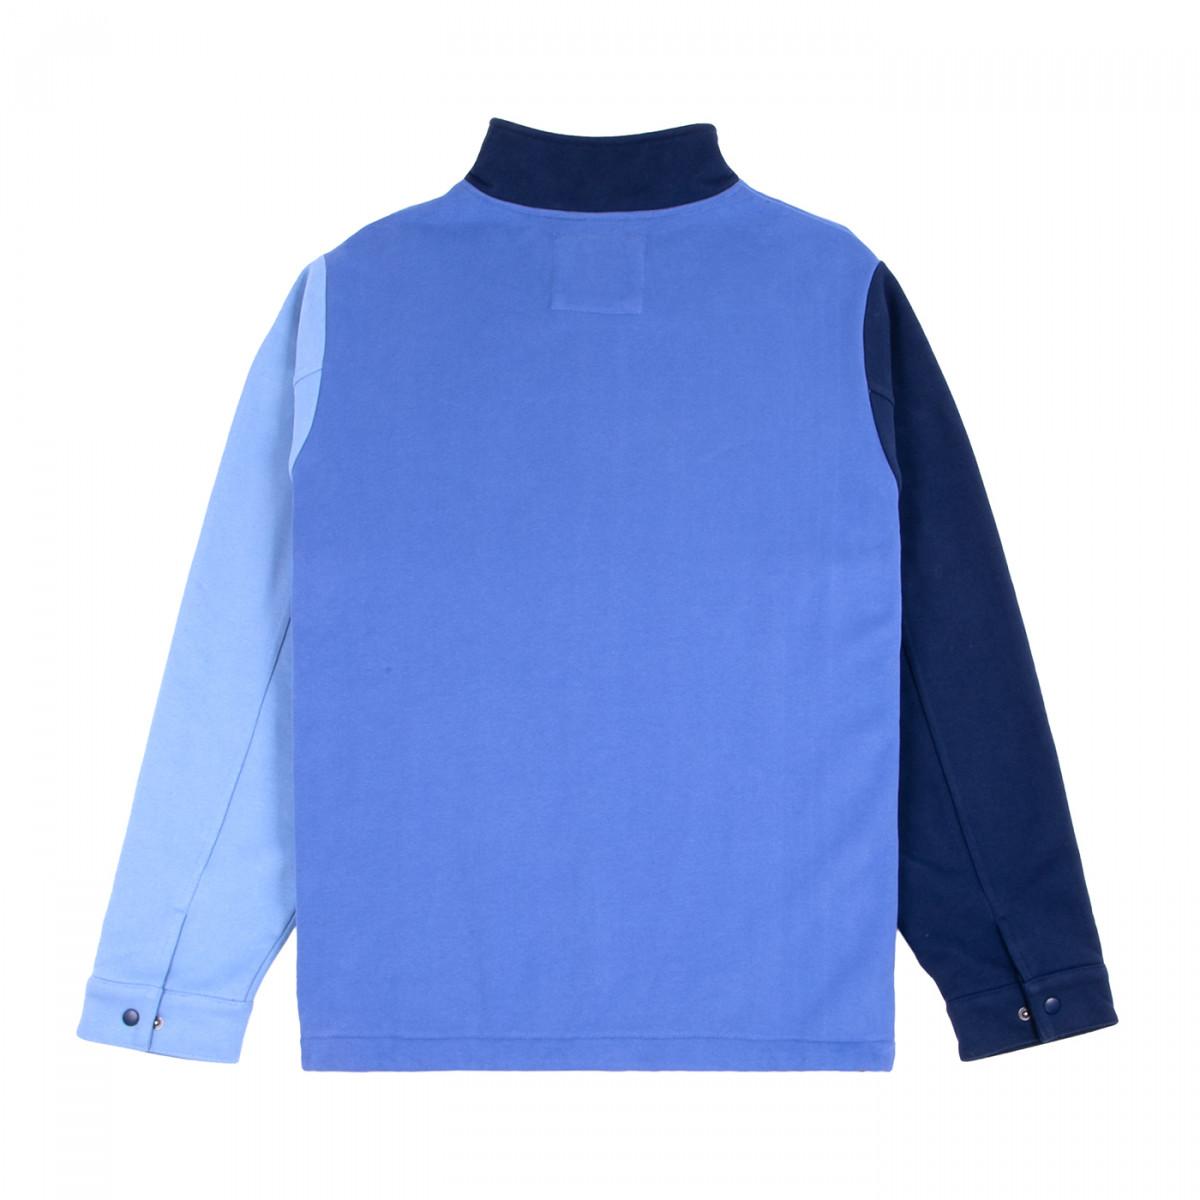 1619069386972_BRUSHED COTTON TRACK JACKET BLUE 2